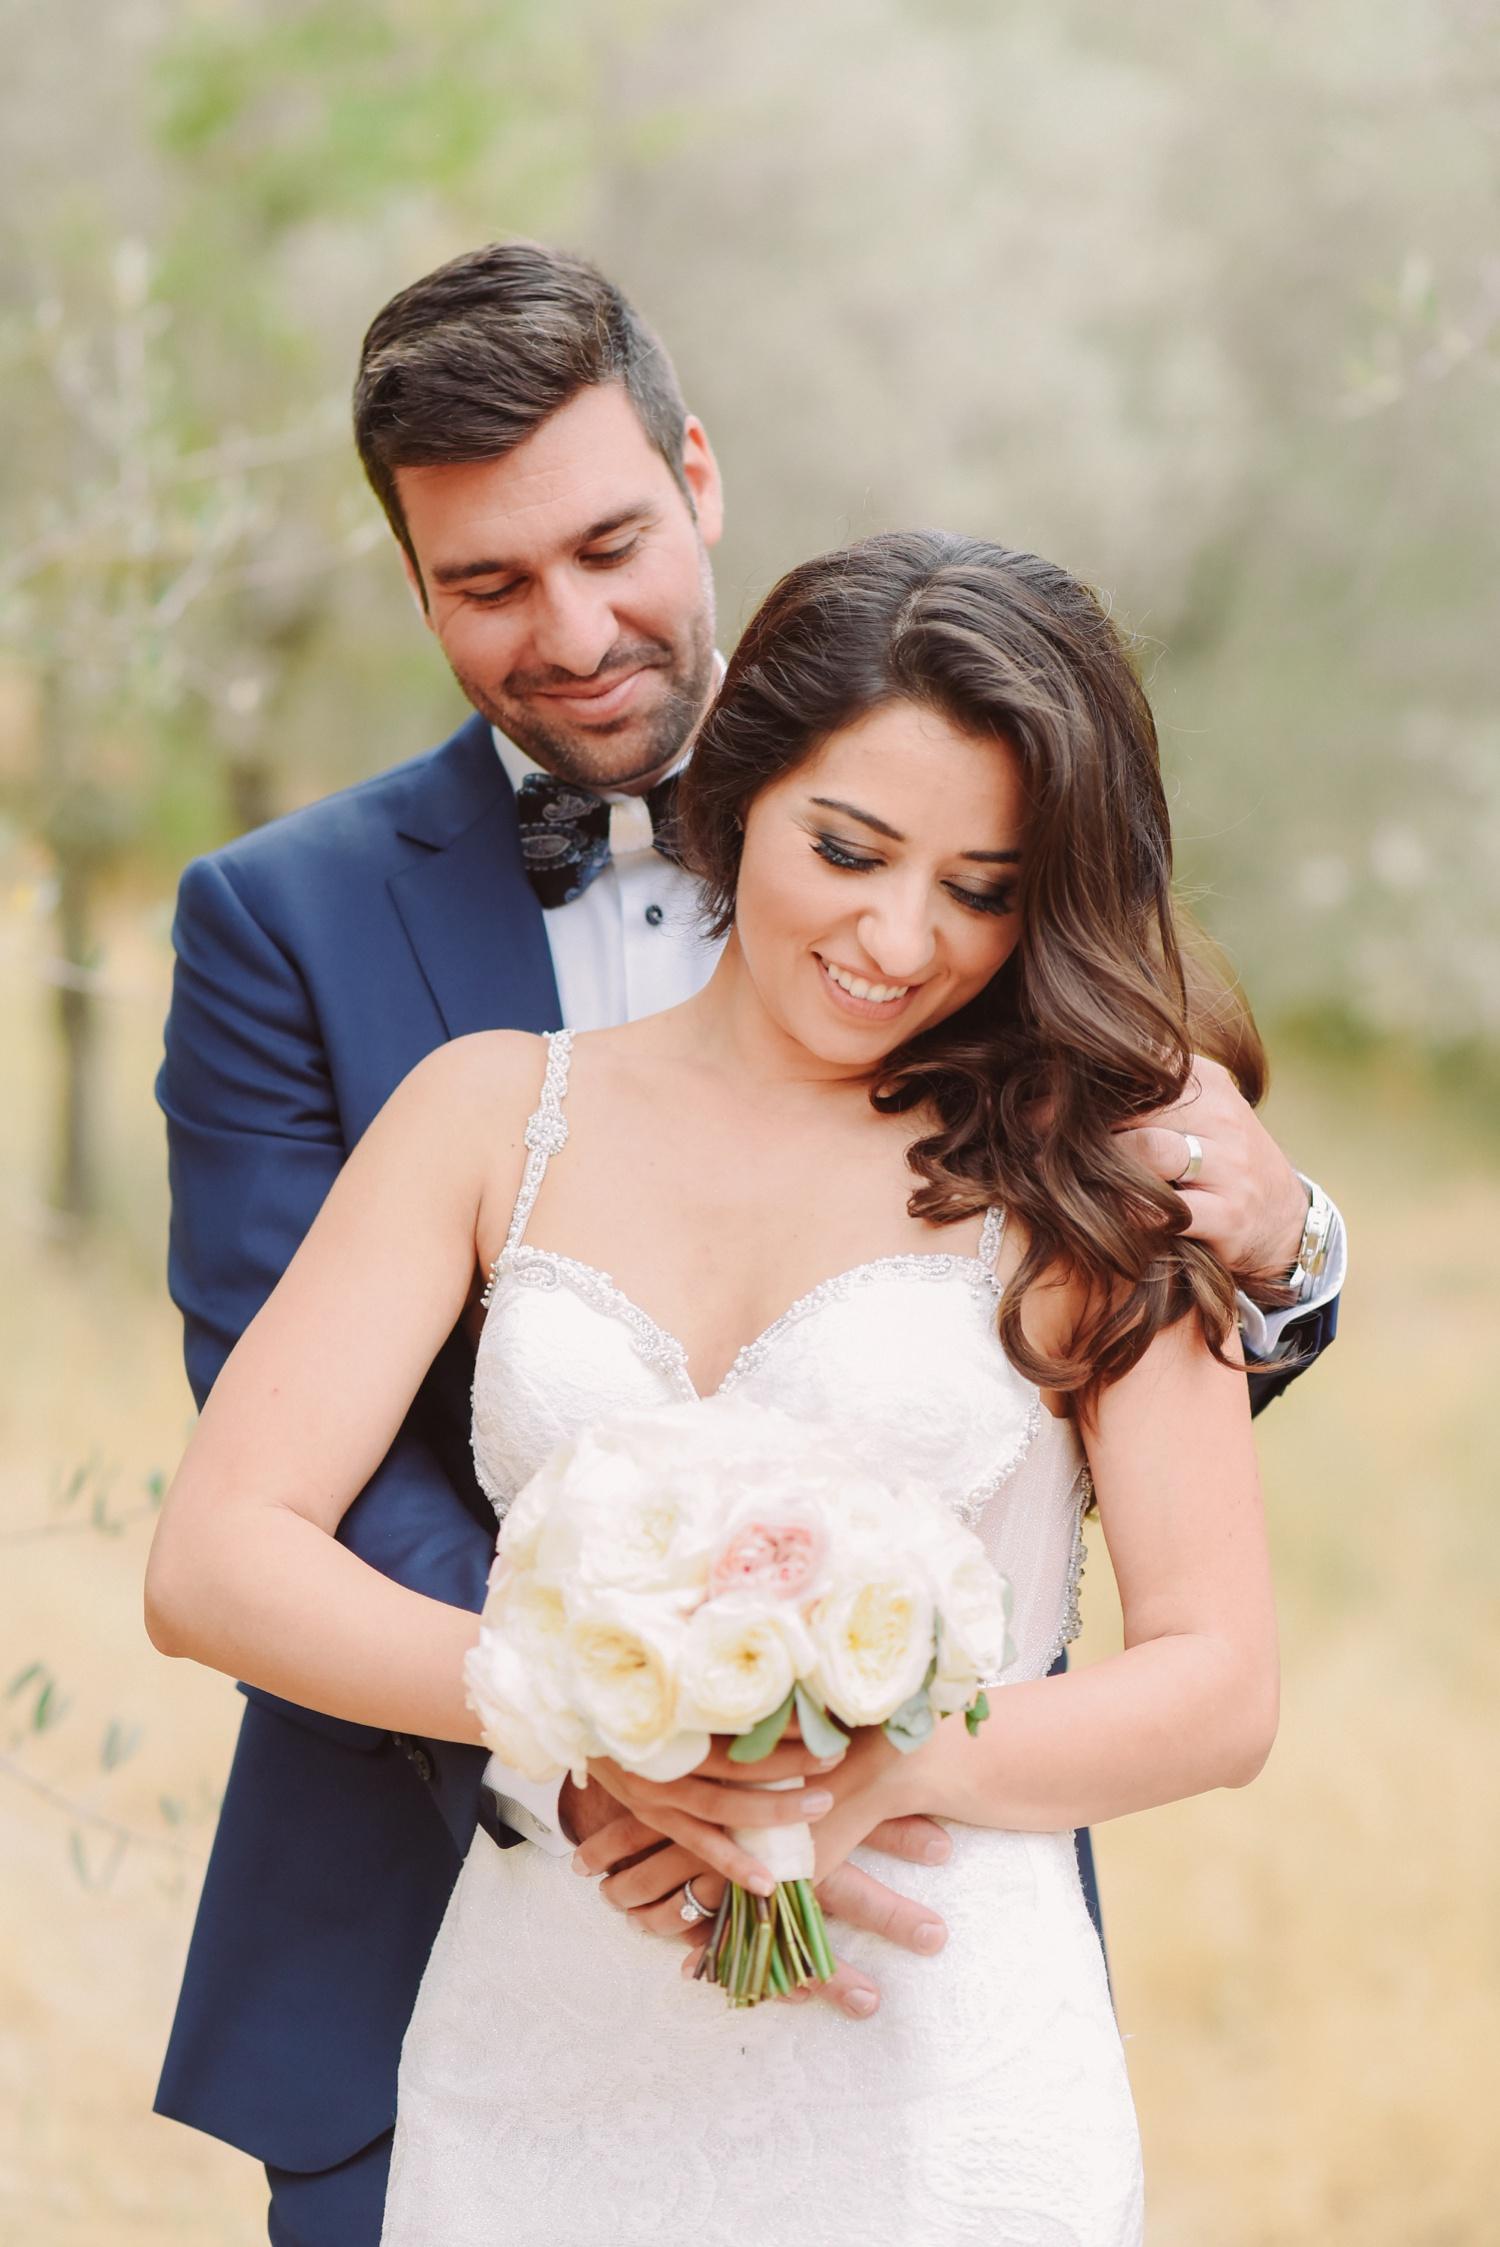 wedding-photographer-florence-vincigliata-tuscany_1098.jpg